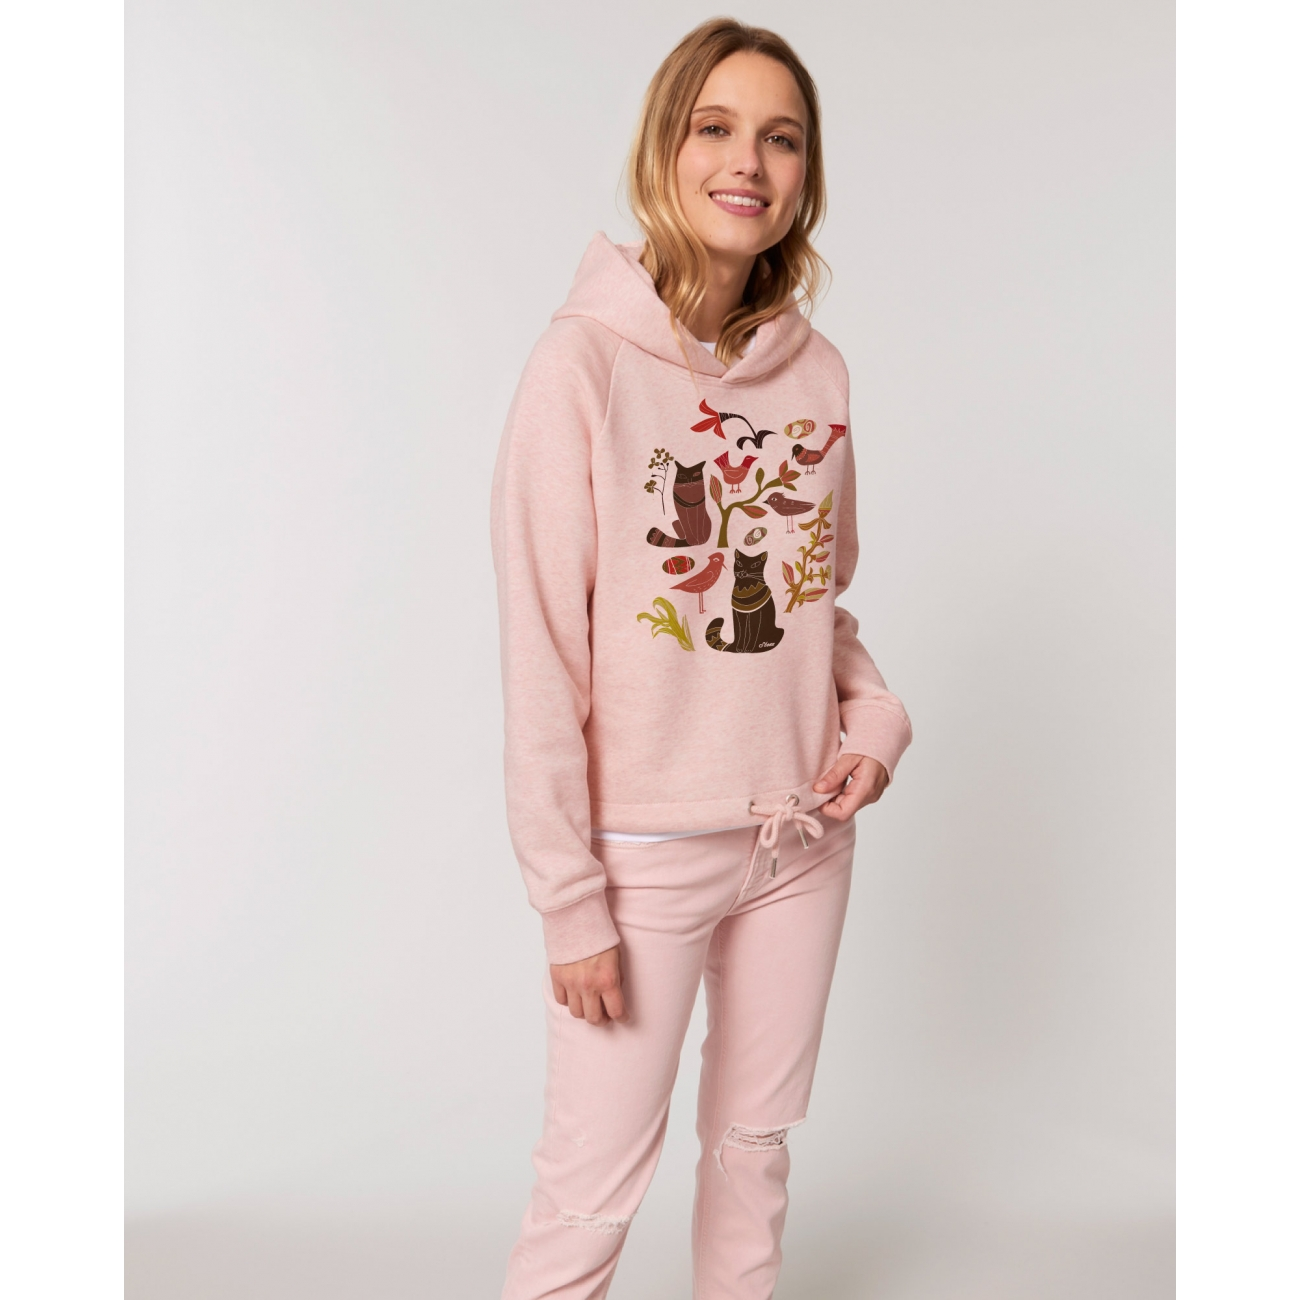 https://tee-shirt-bio.com/8919-thickbox_default/sweat-court-a-capuche-femme-coton-bio-rose-clair-chine.jpg